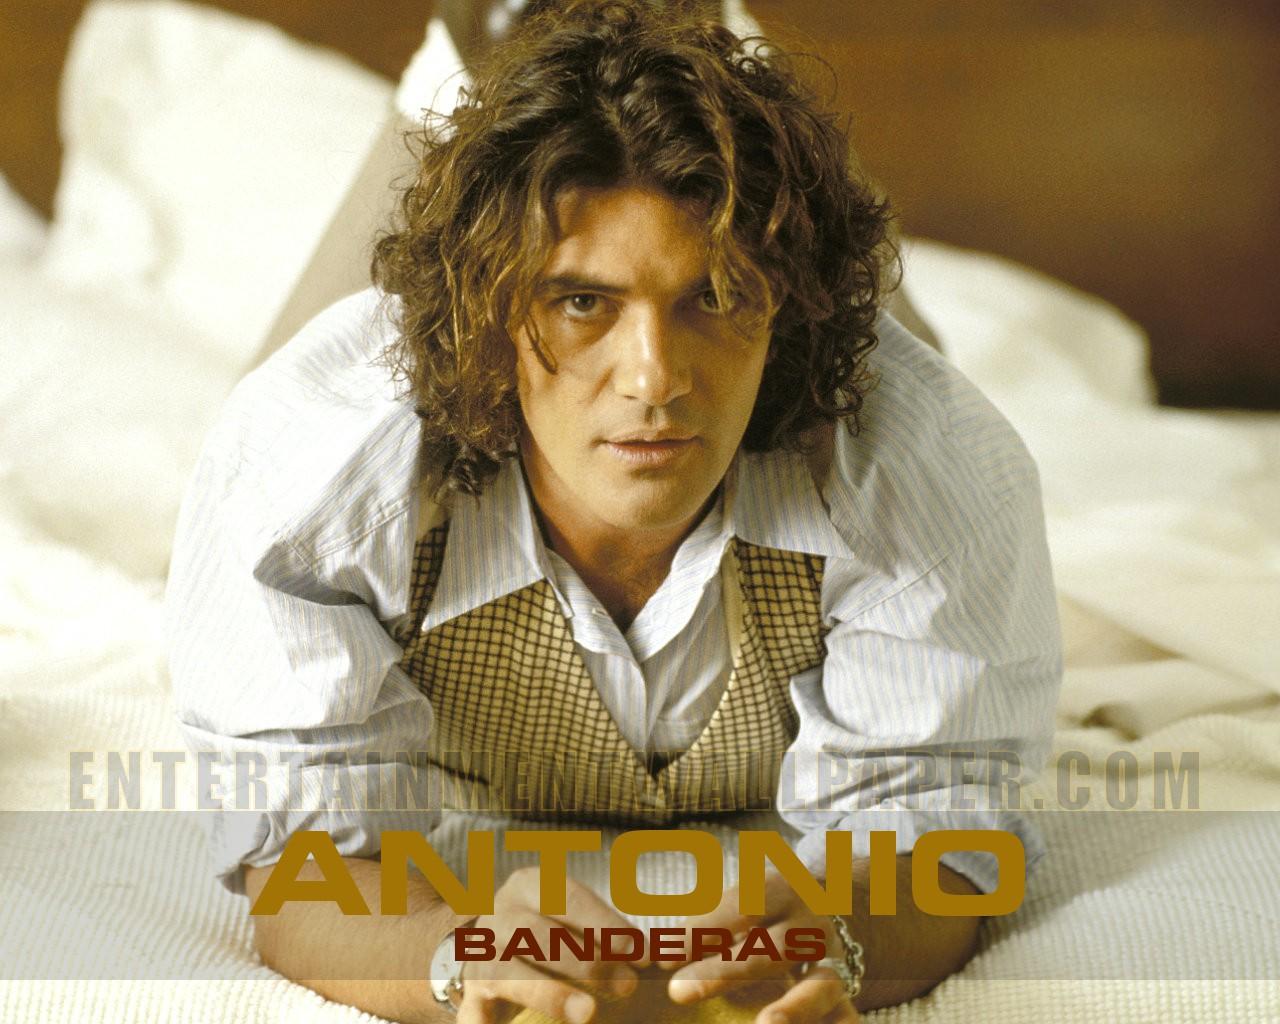 Antonio Banderas Wallpaper 14   1280 X 1024 stmednet 1280x1024